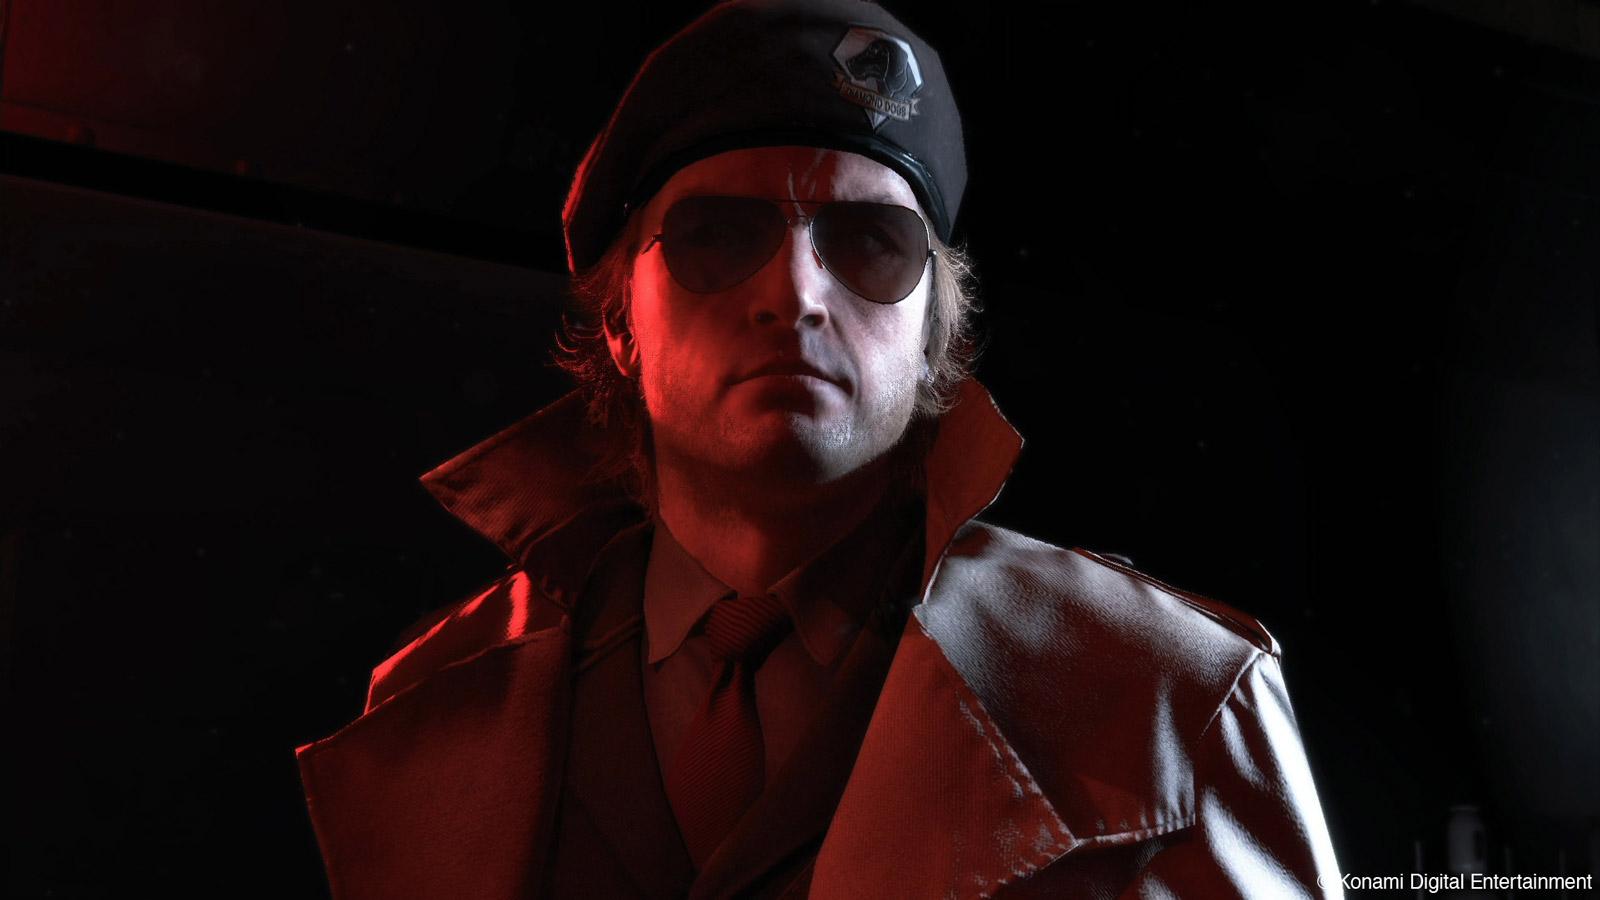 Free Metal Gear Solid V: The Phantom Pain Wallpaper in 1600x900